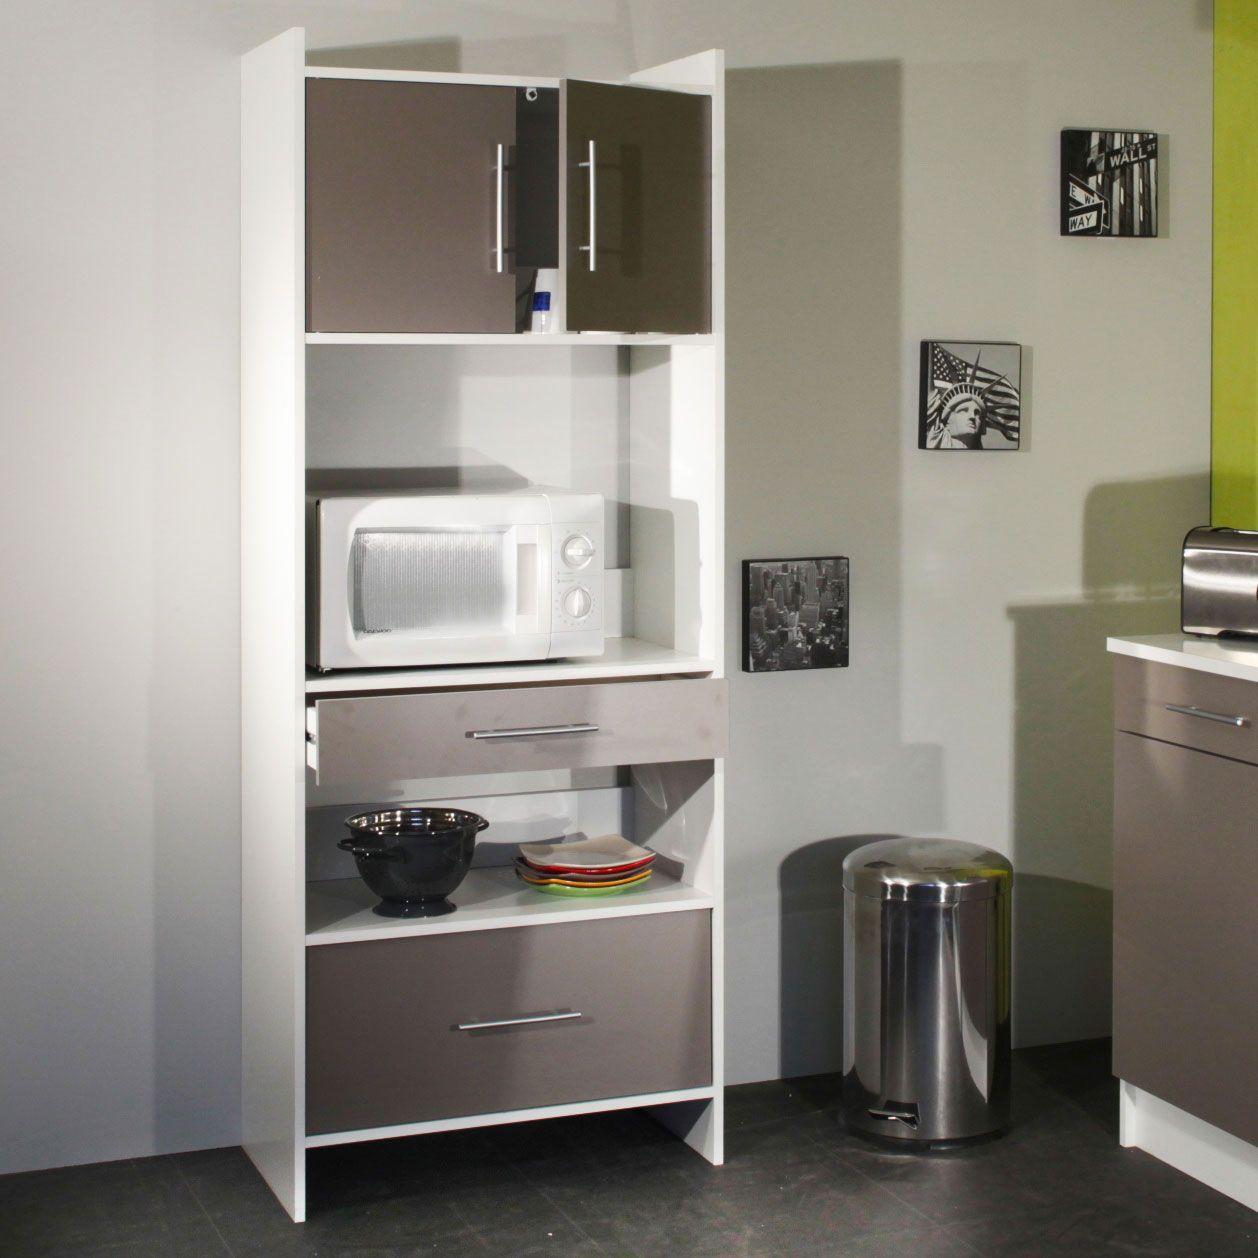 meuble pour micro onde gamboahinestrosa